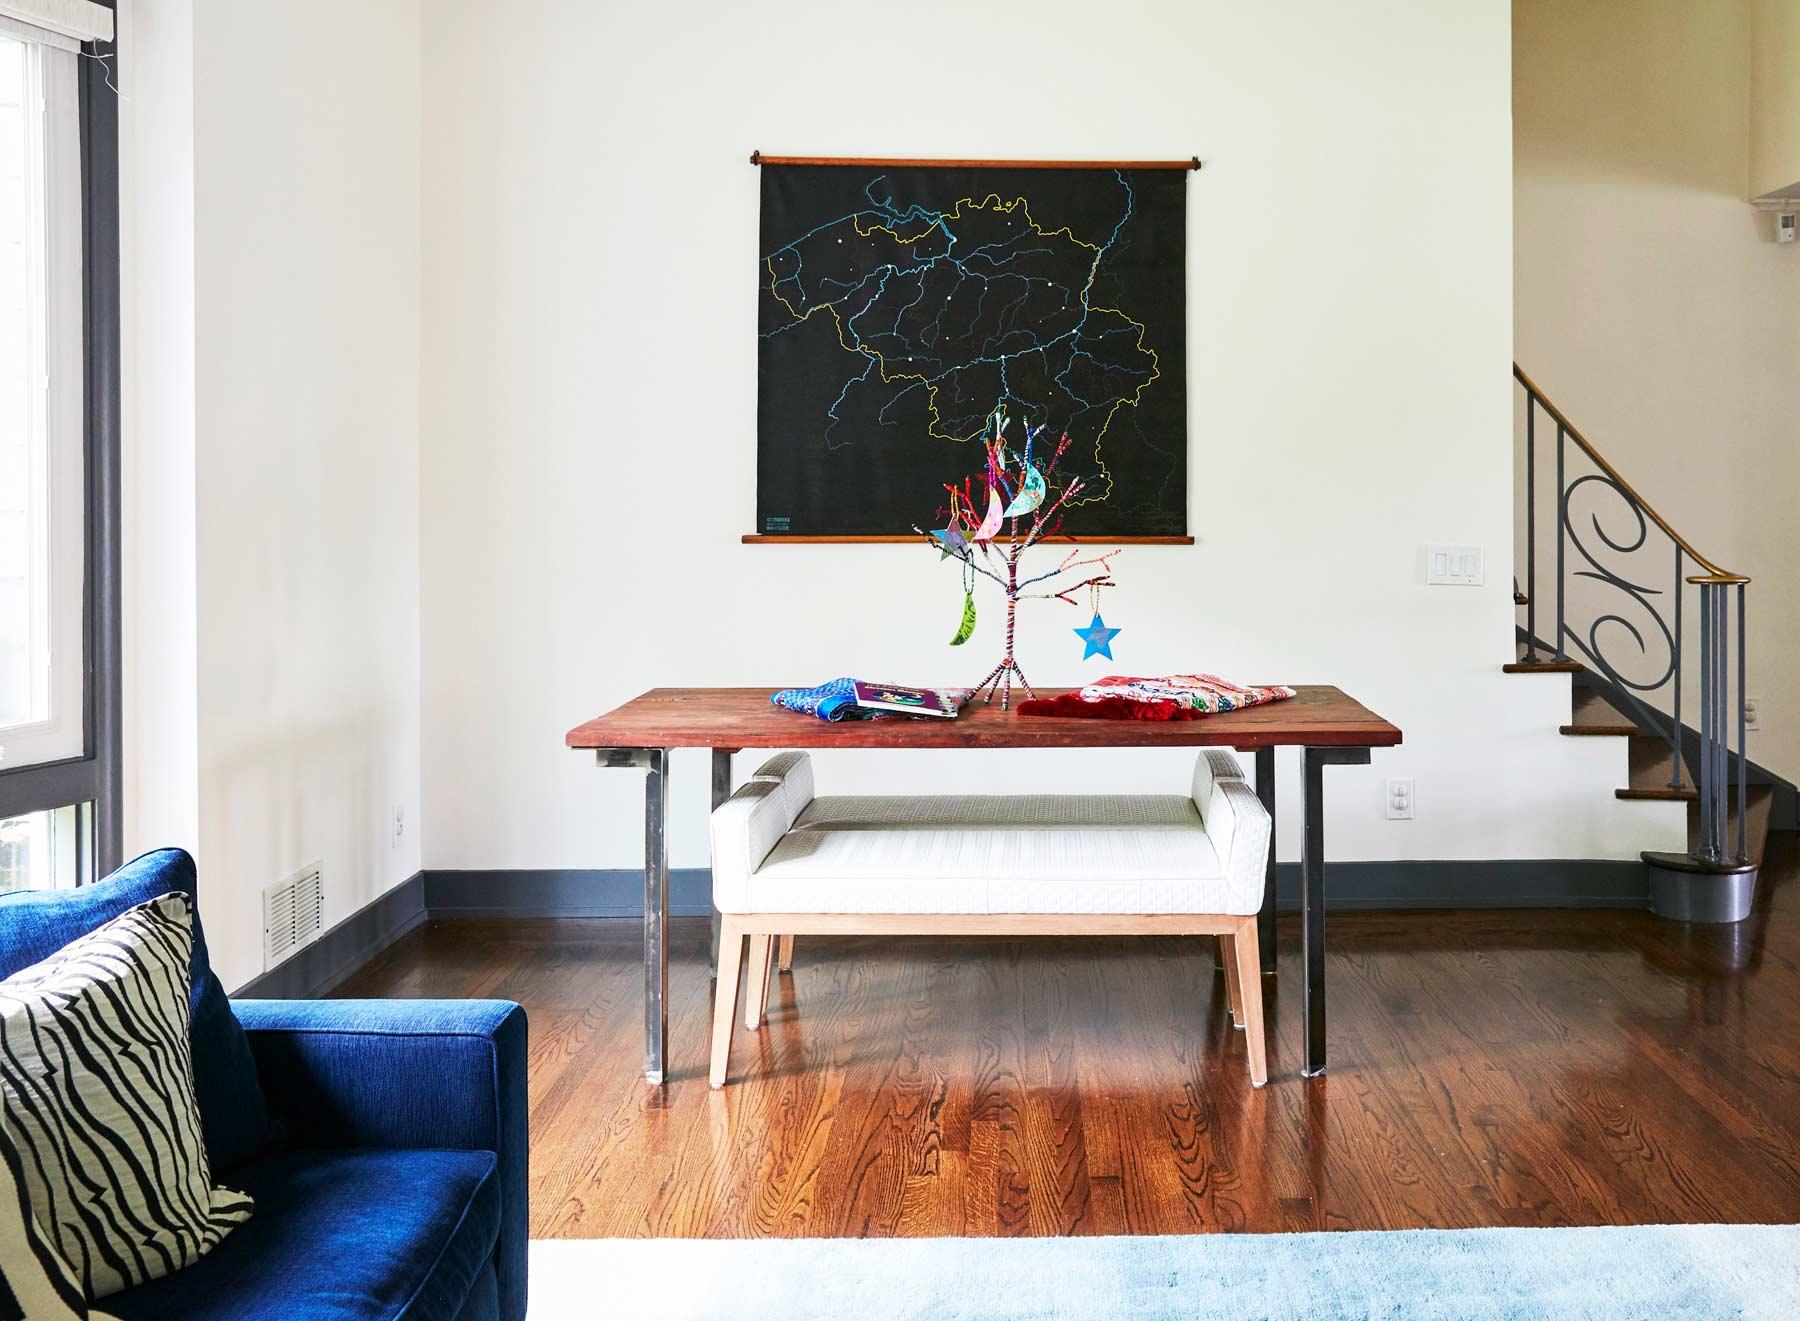 Mid century modern family room designed by Nureed Saeed. South Orange NJ